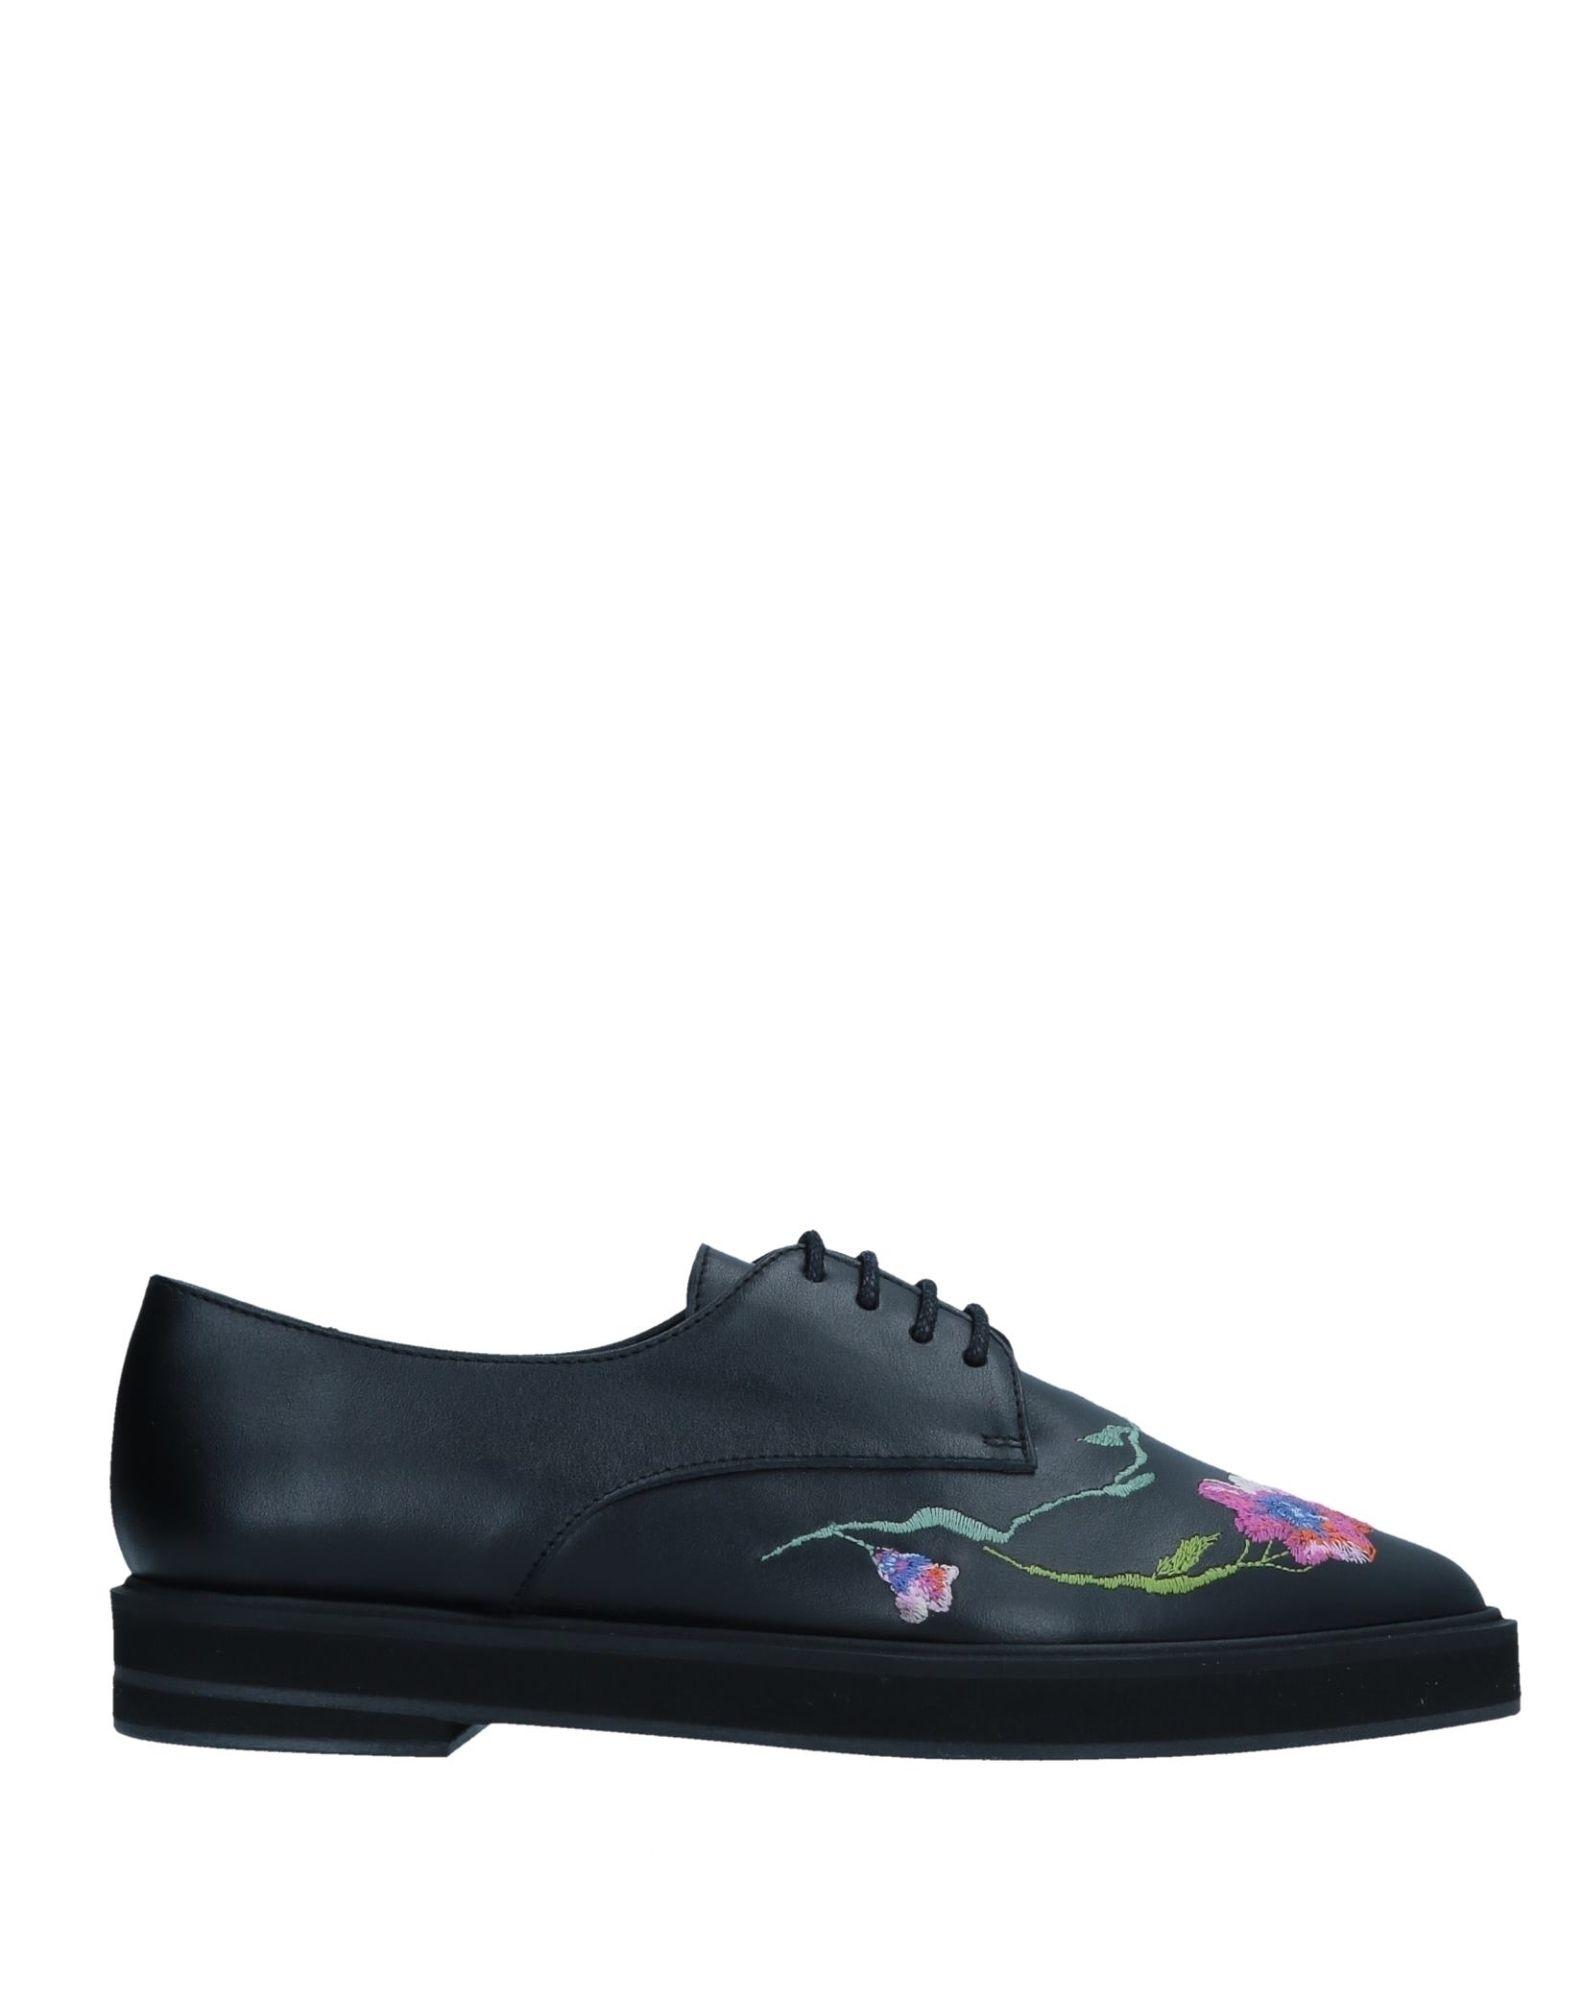 Paul & Joe aussehende Schnürschuhe Damen  11549732LPGut aussehende Joe strapazierfähige Schuhe fbc4e6